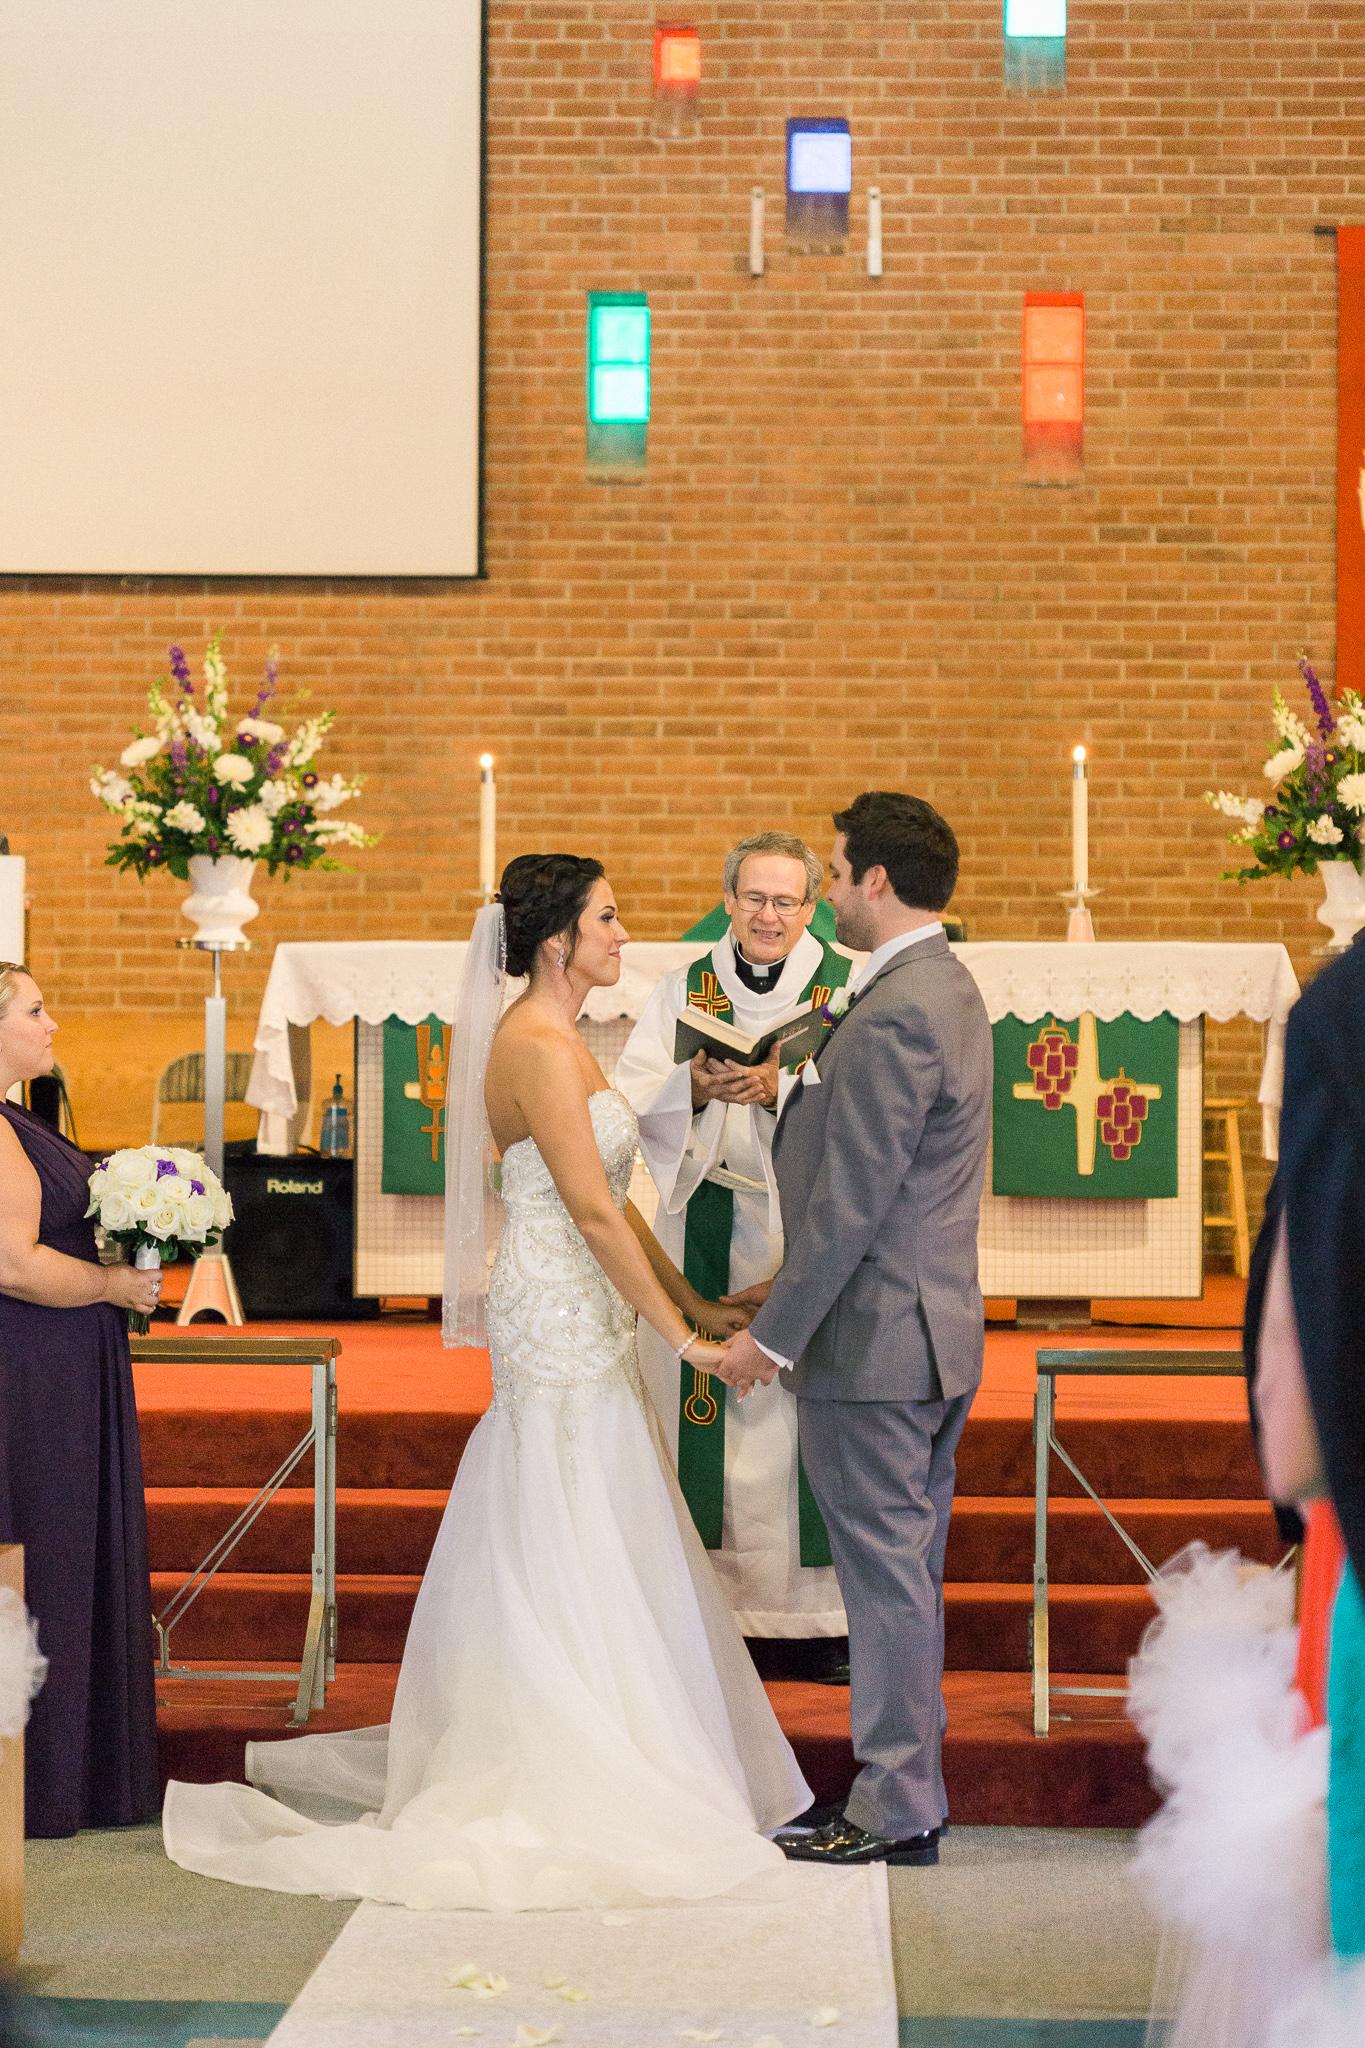 hope-lutheran-church-wedding